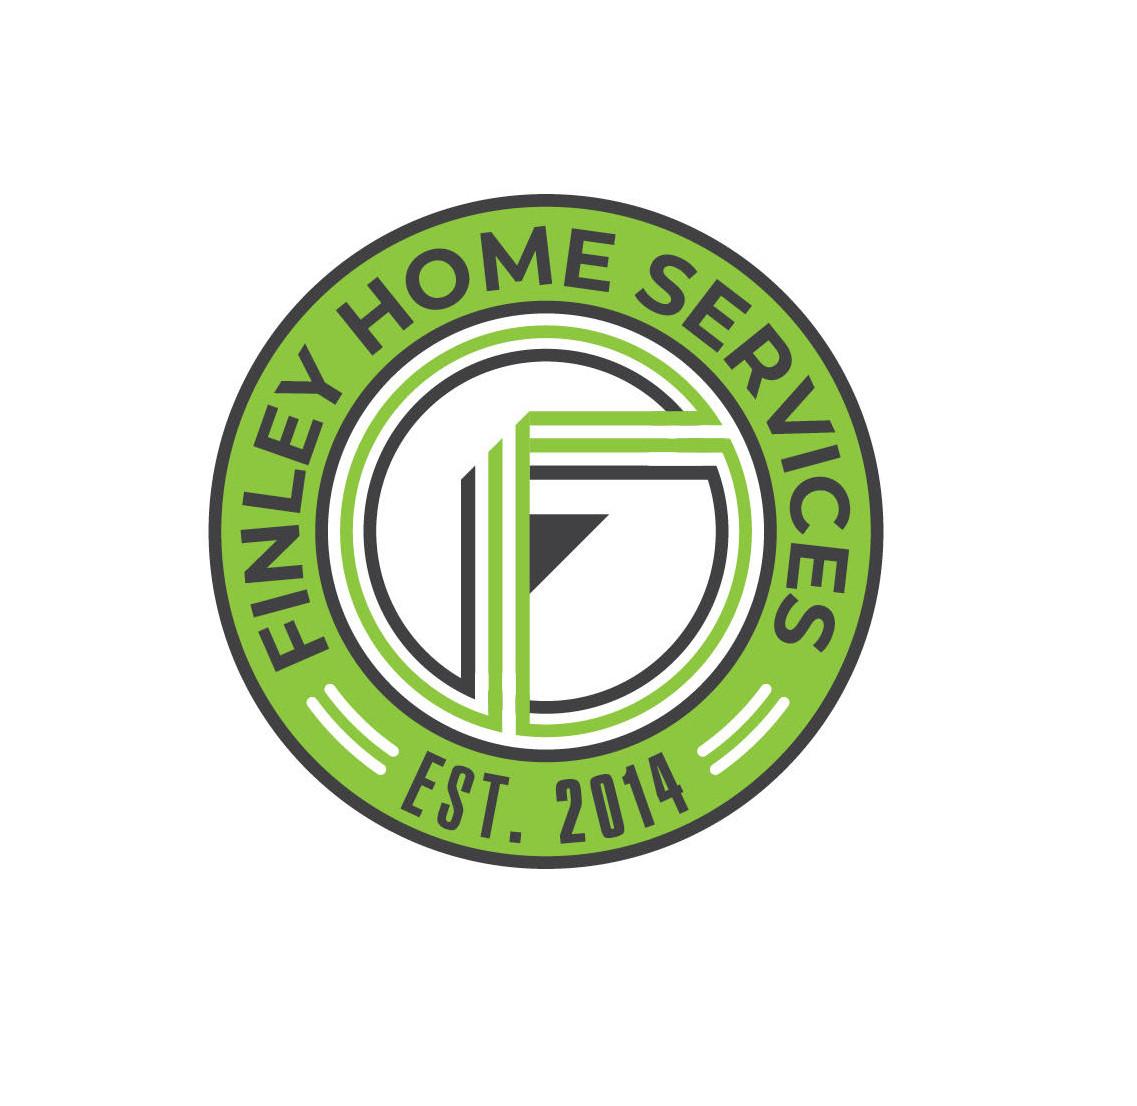 Finley Home Services, Inc.